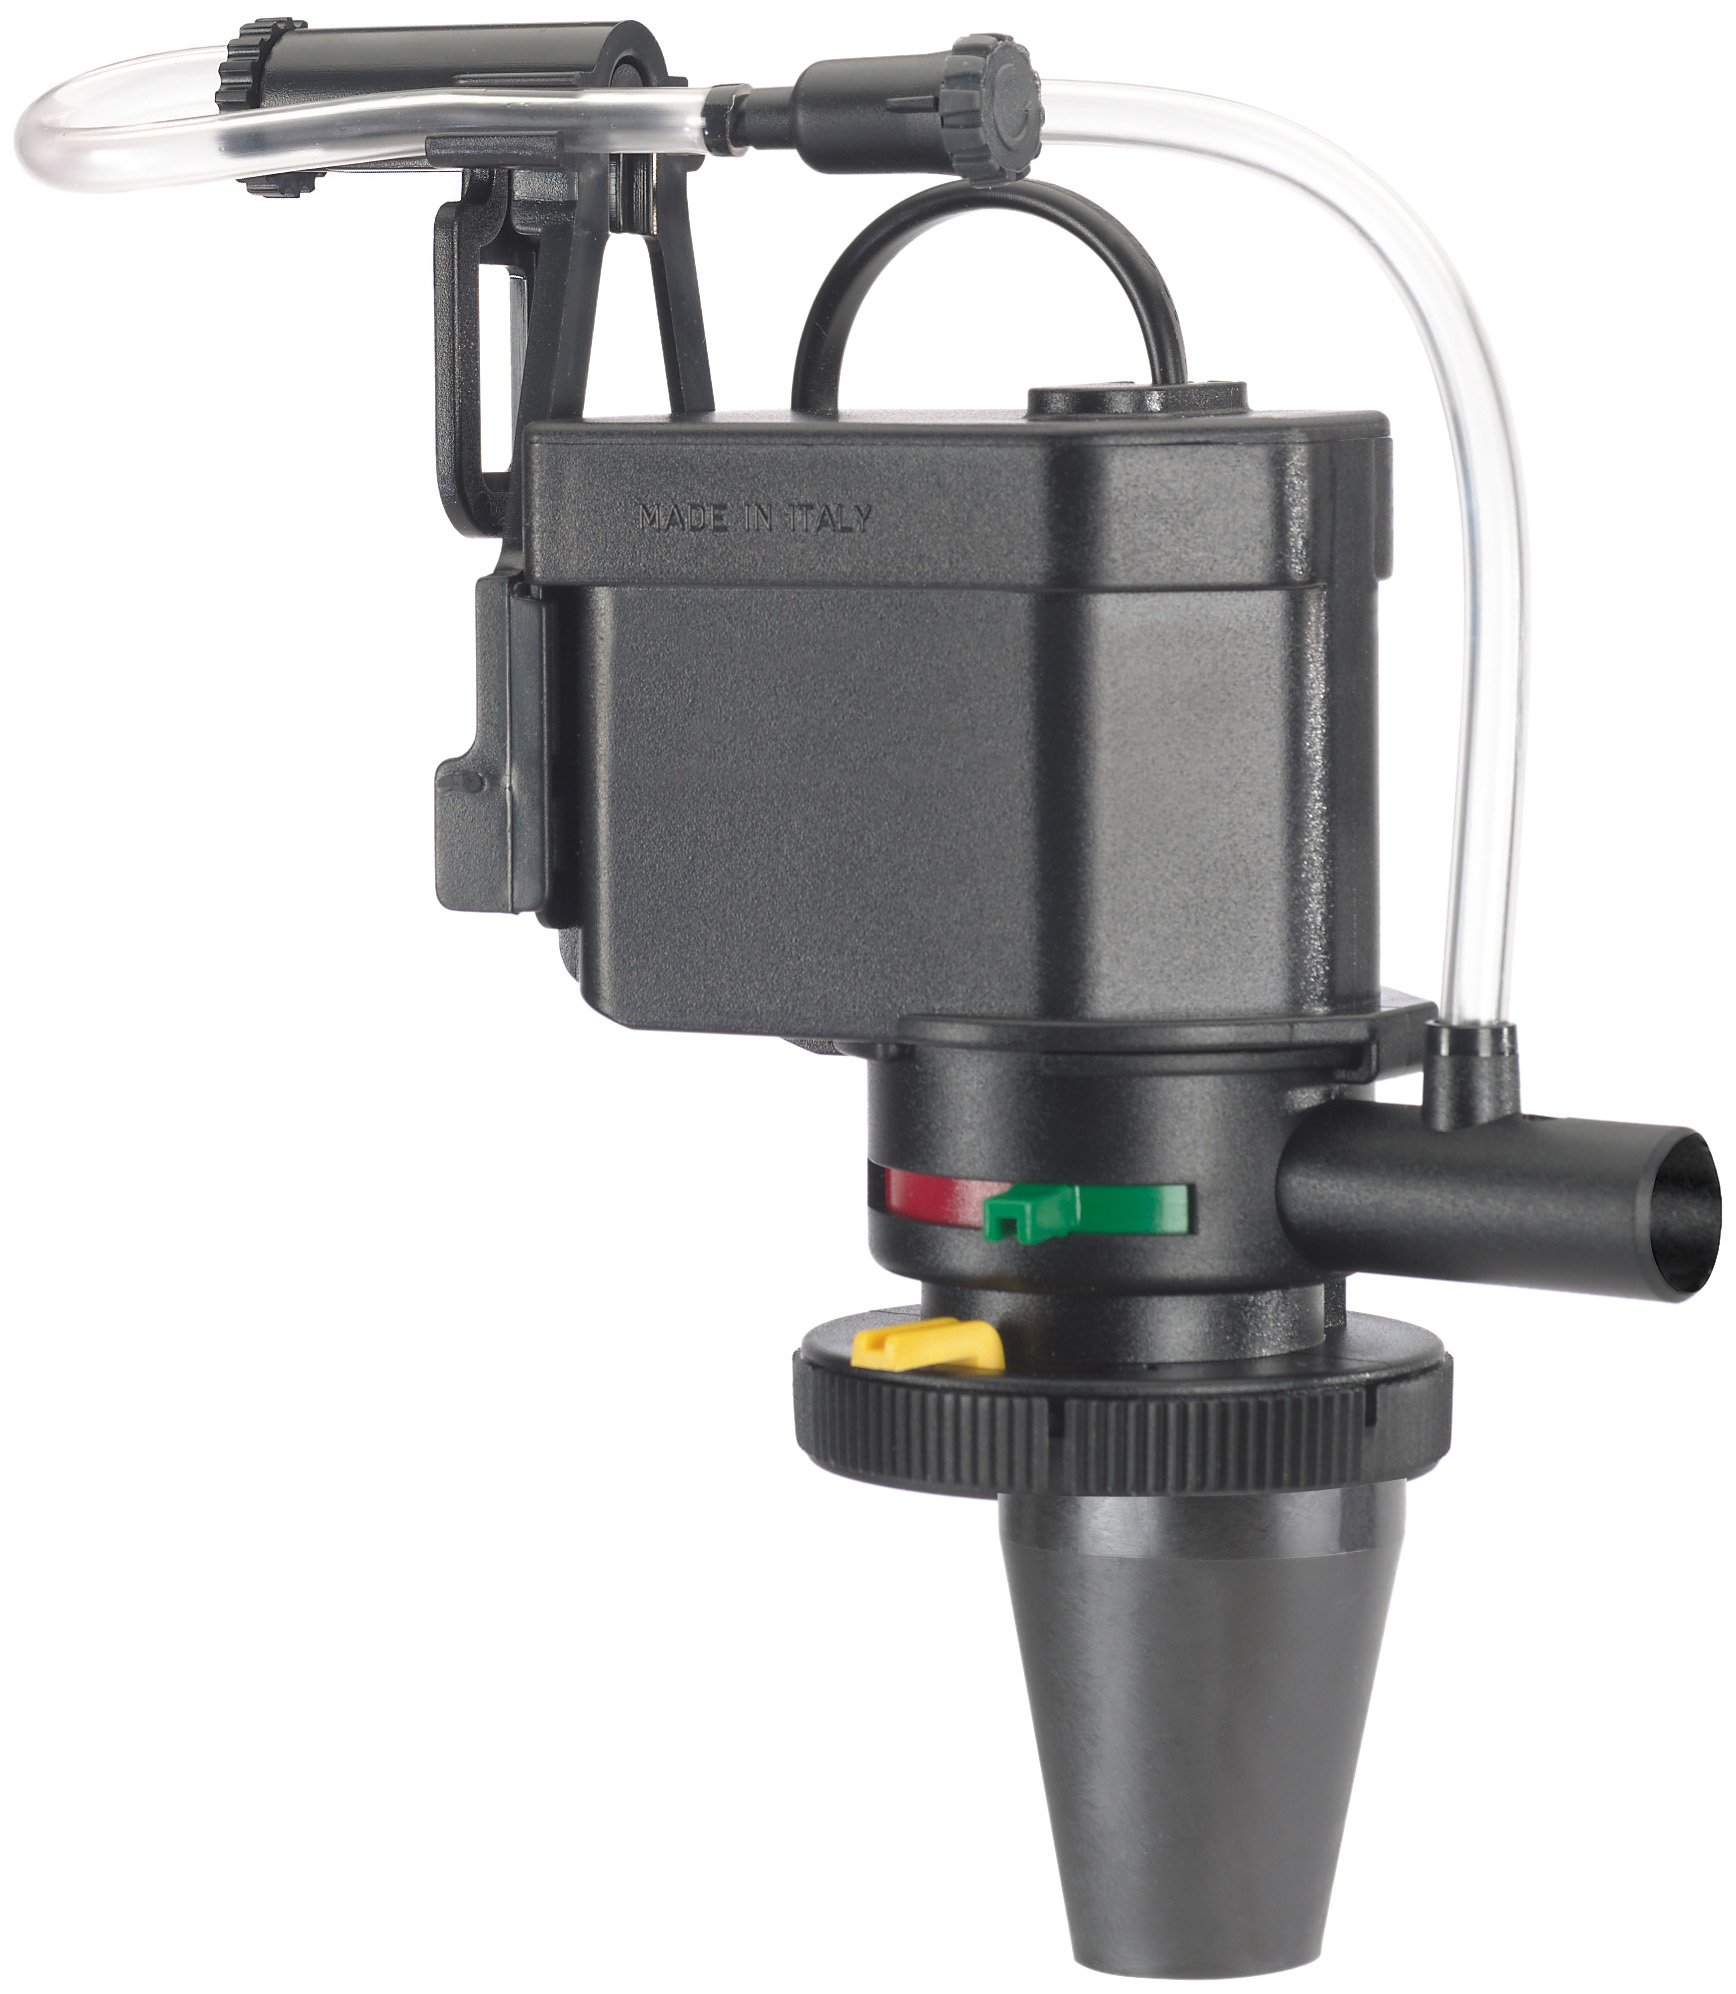 AquaClear 70 Powerhead, 400 Gallons per Hour, UL Listed by Aqua Clear